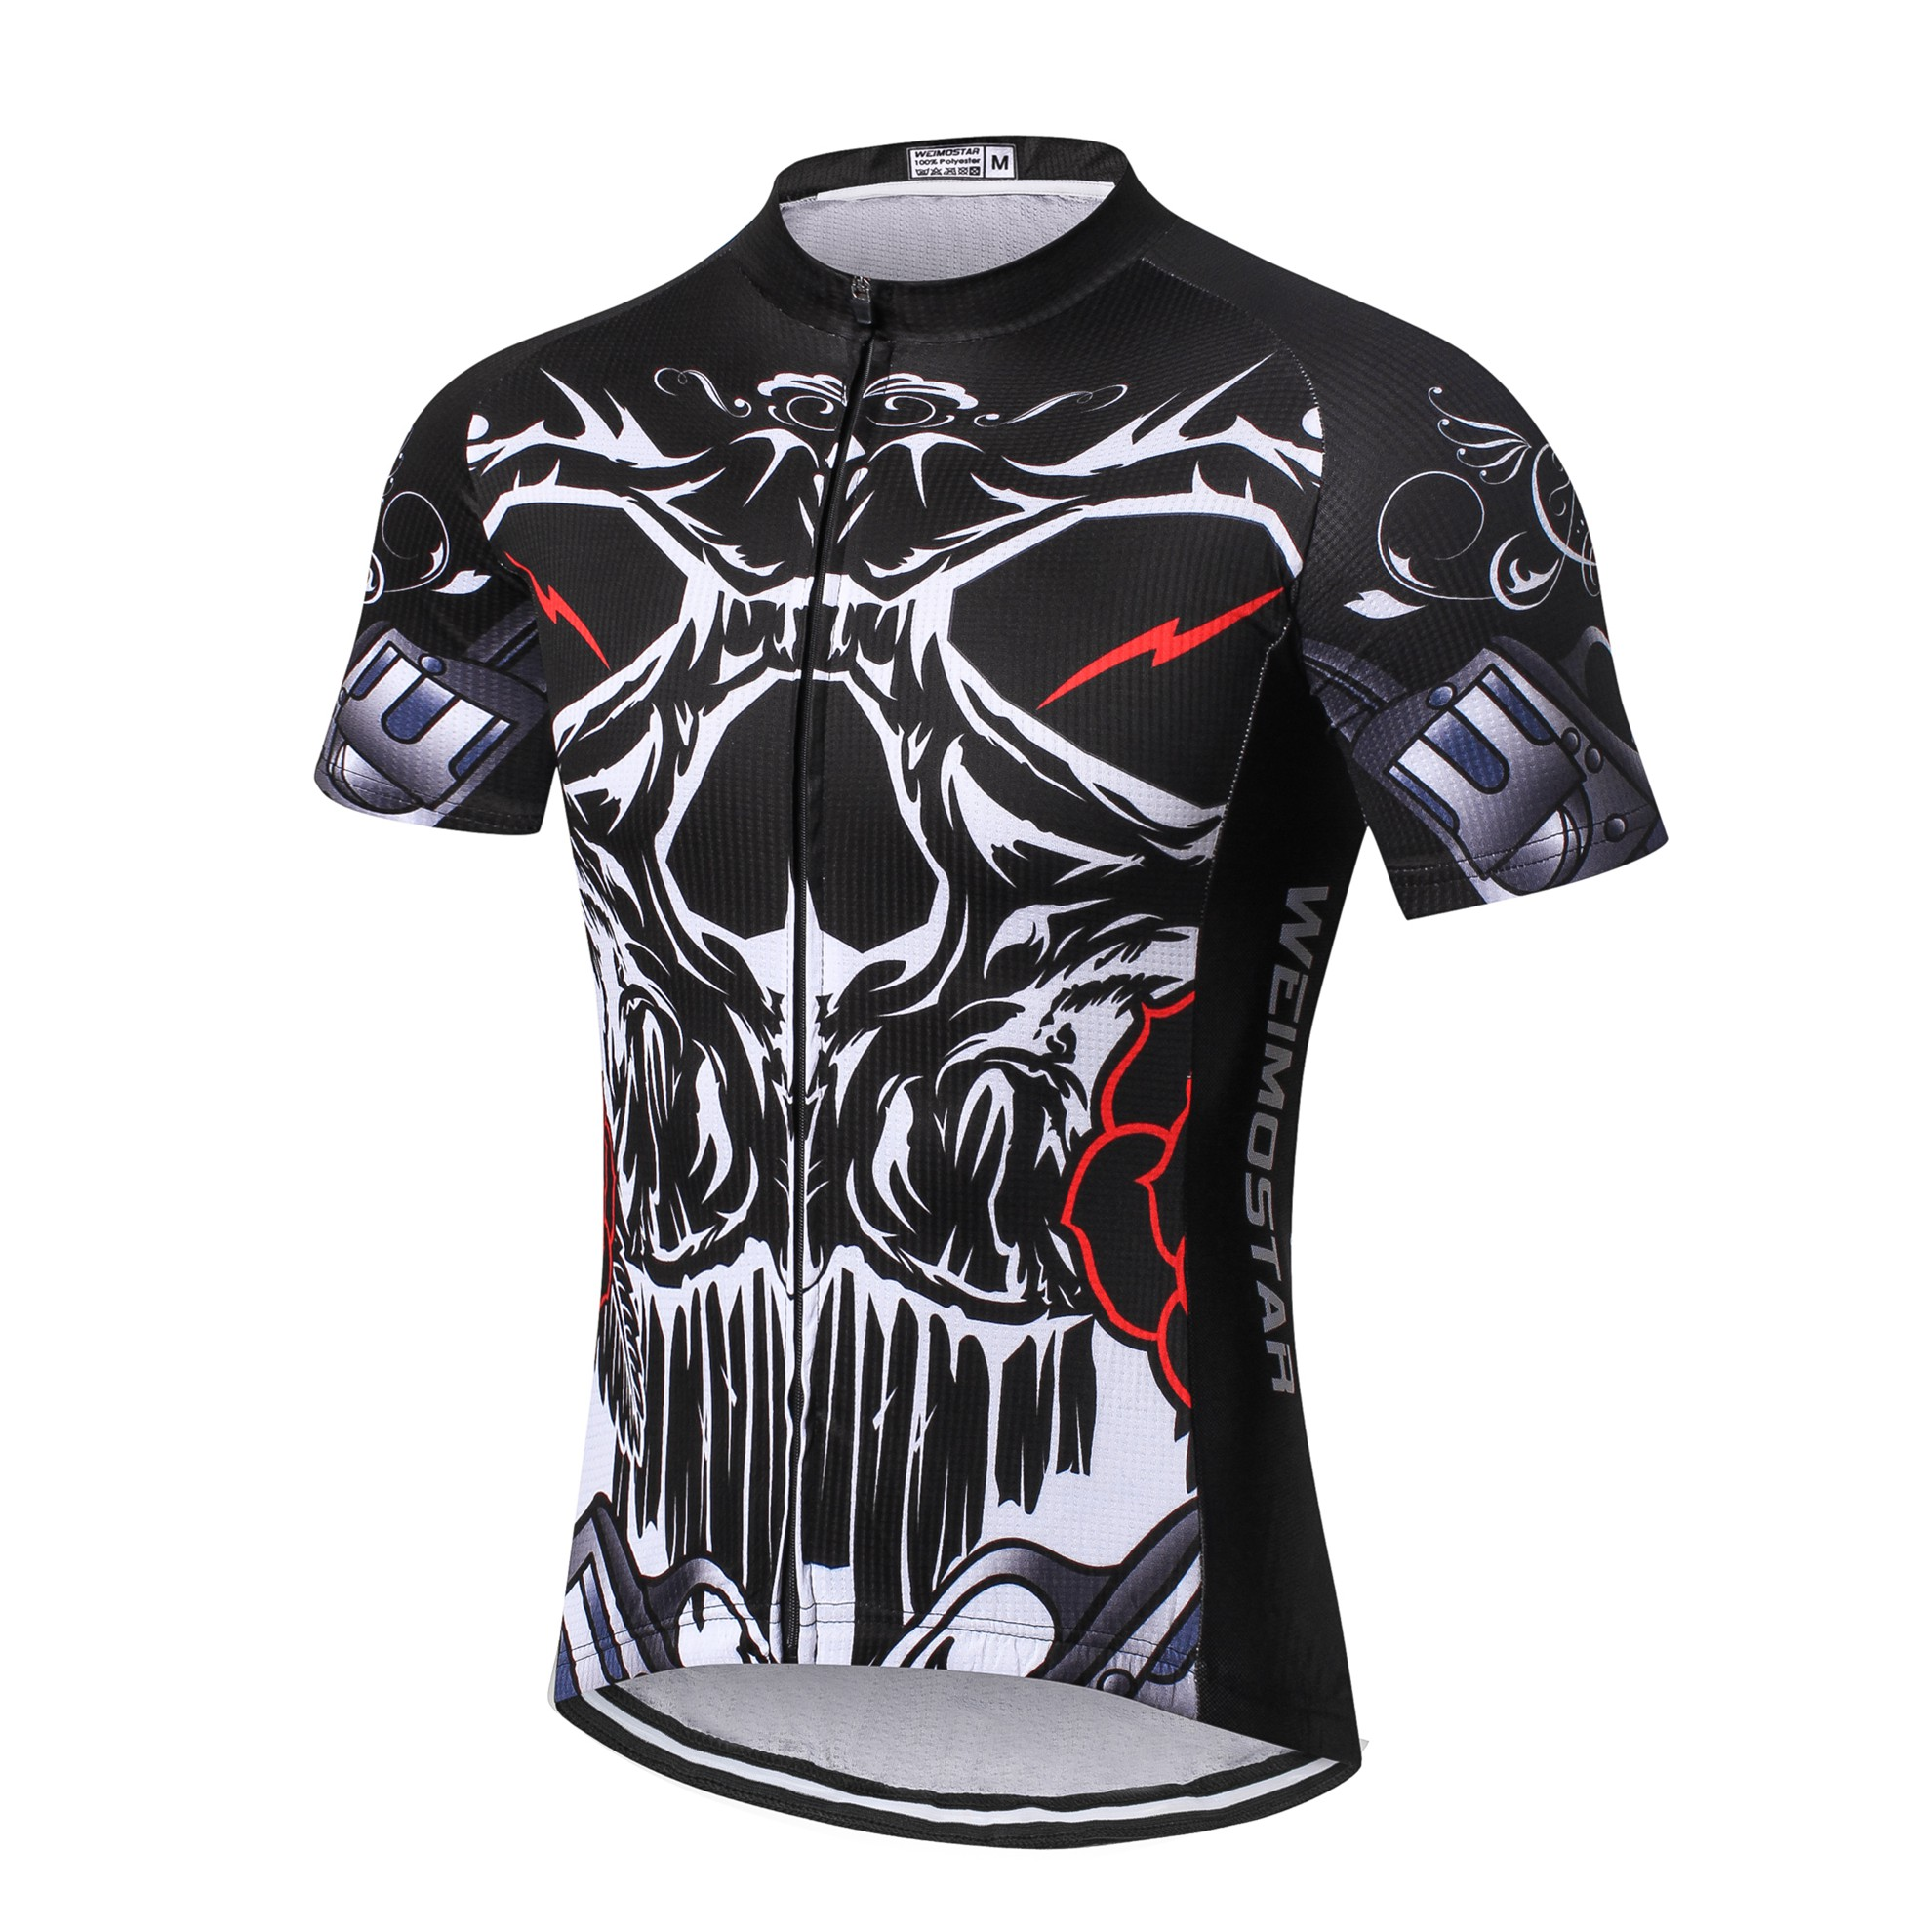 Weimostar Men Cycling Jersey Bike Clothing Skull Black Bicycle Shirt Tops S-3XL